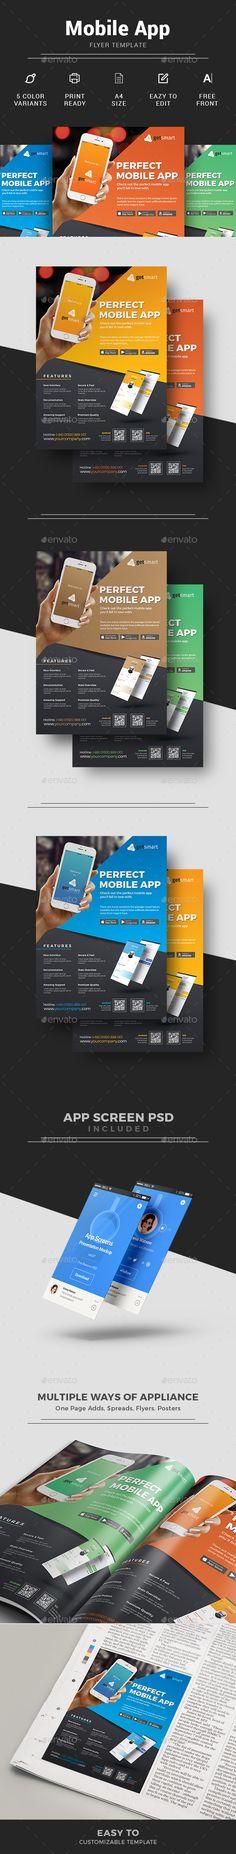 Mobile App Flyer - Commerce Flyers.Download here: http://graphicriver.net/item/mobile-app-flyer/16149992?ref=arroganttype